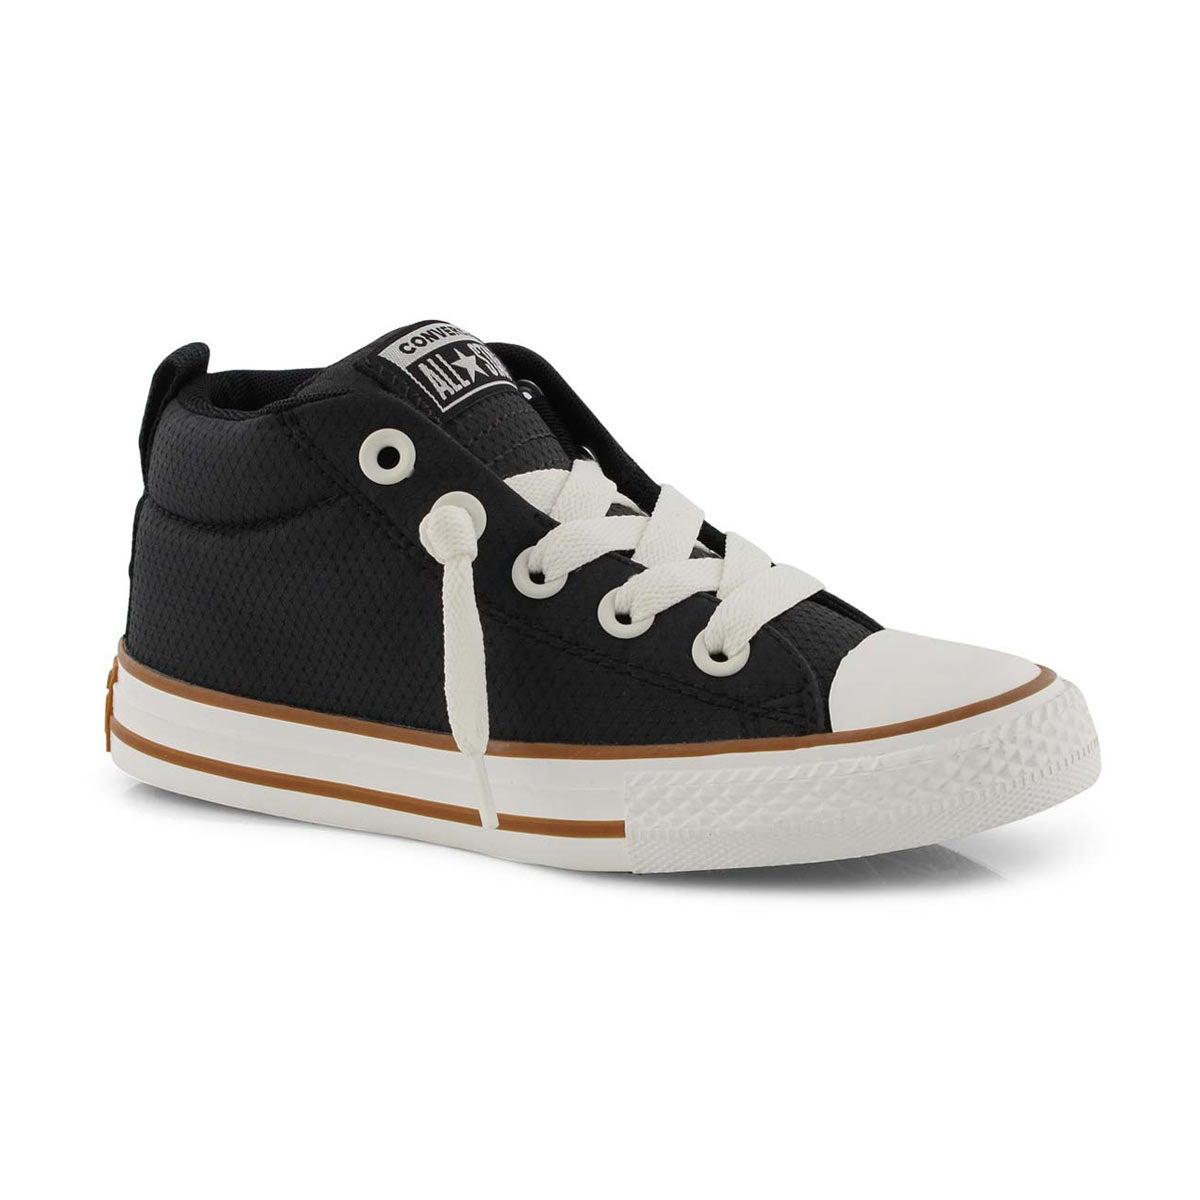 Converse Boys/' Chuck Taylor All Star Street Mid Sneaker